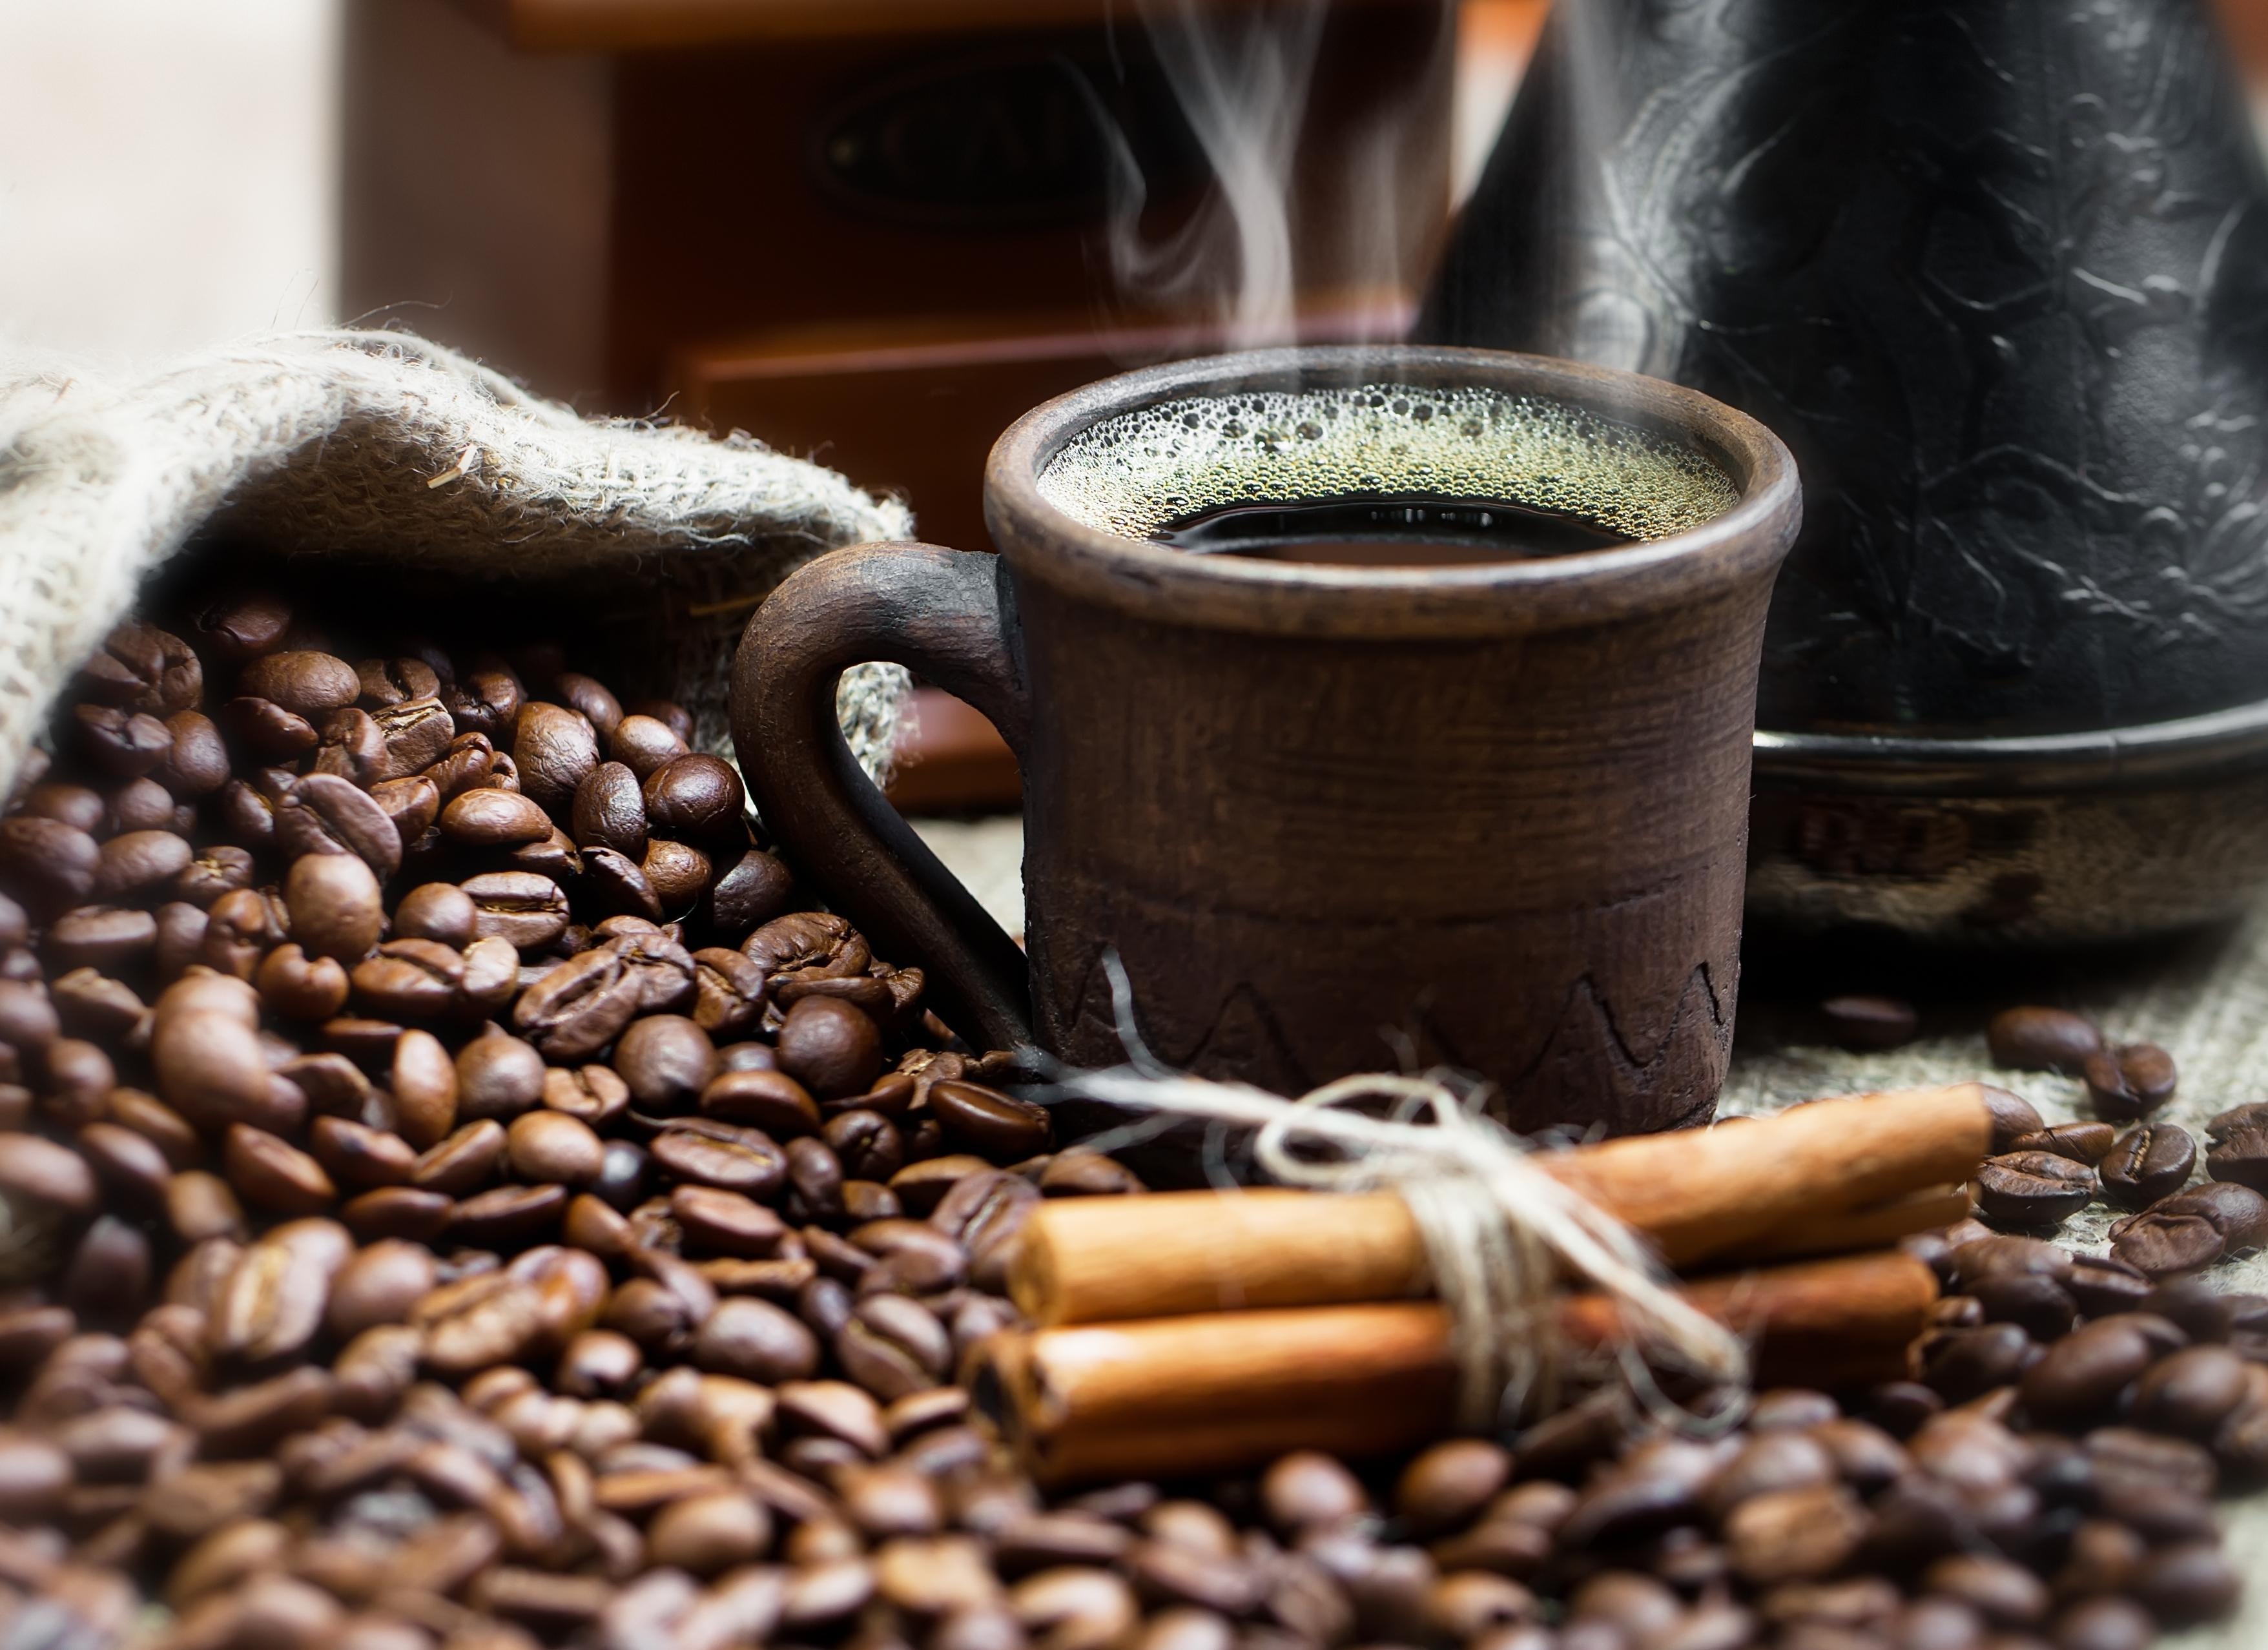 корица кофе чашка cinnamon coffee Cup  № 1119798 загрузить